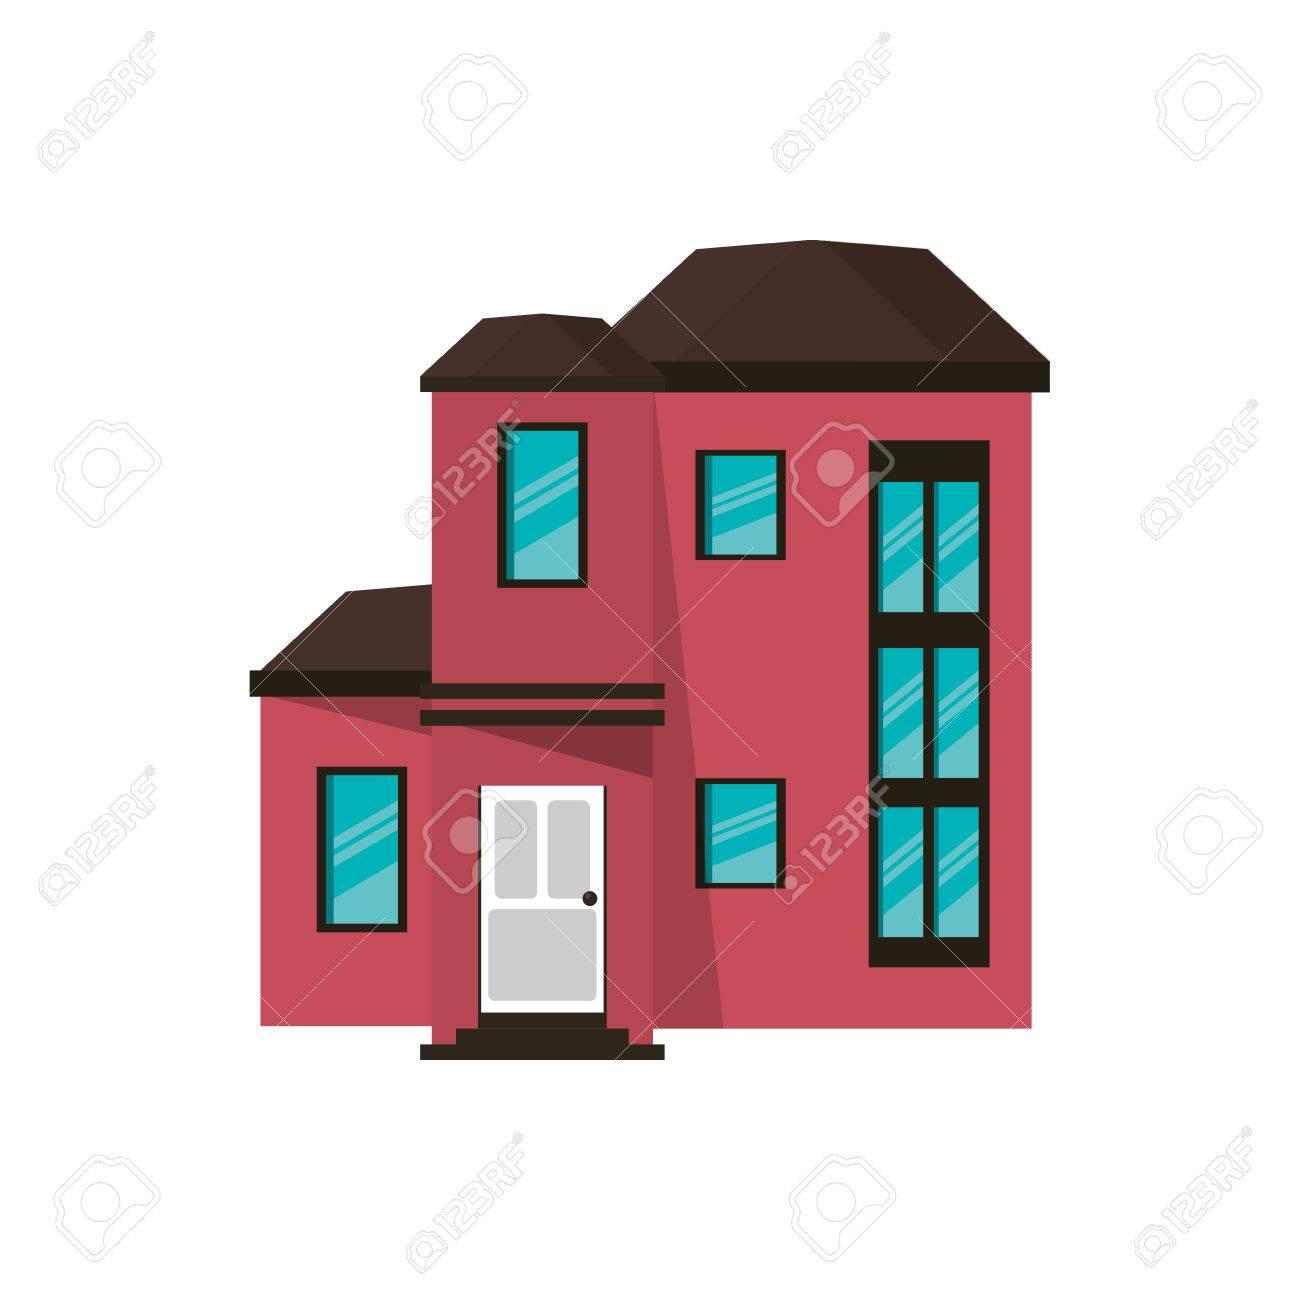 Eps Haus on